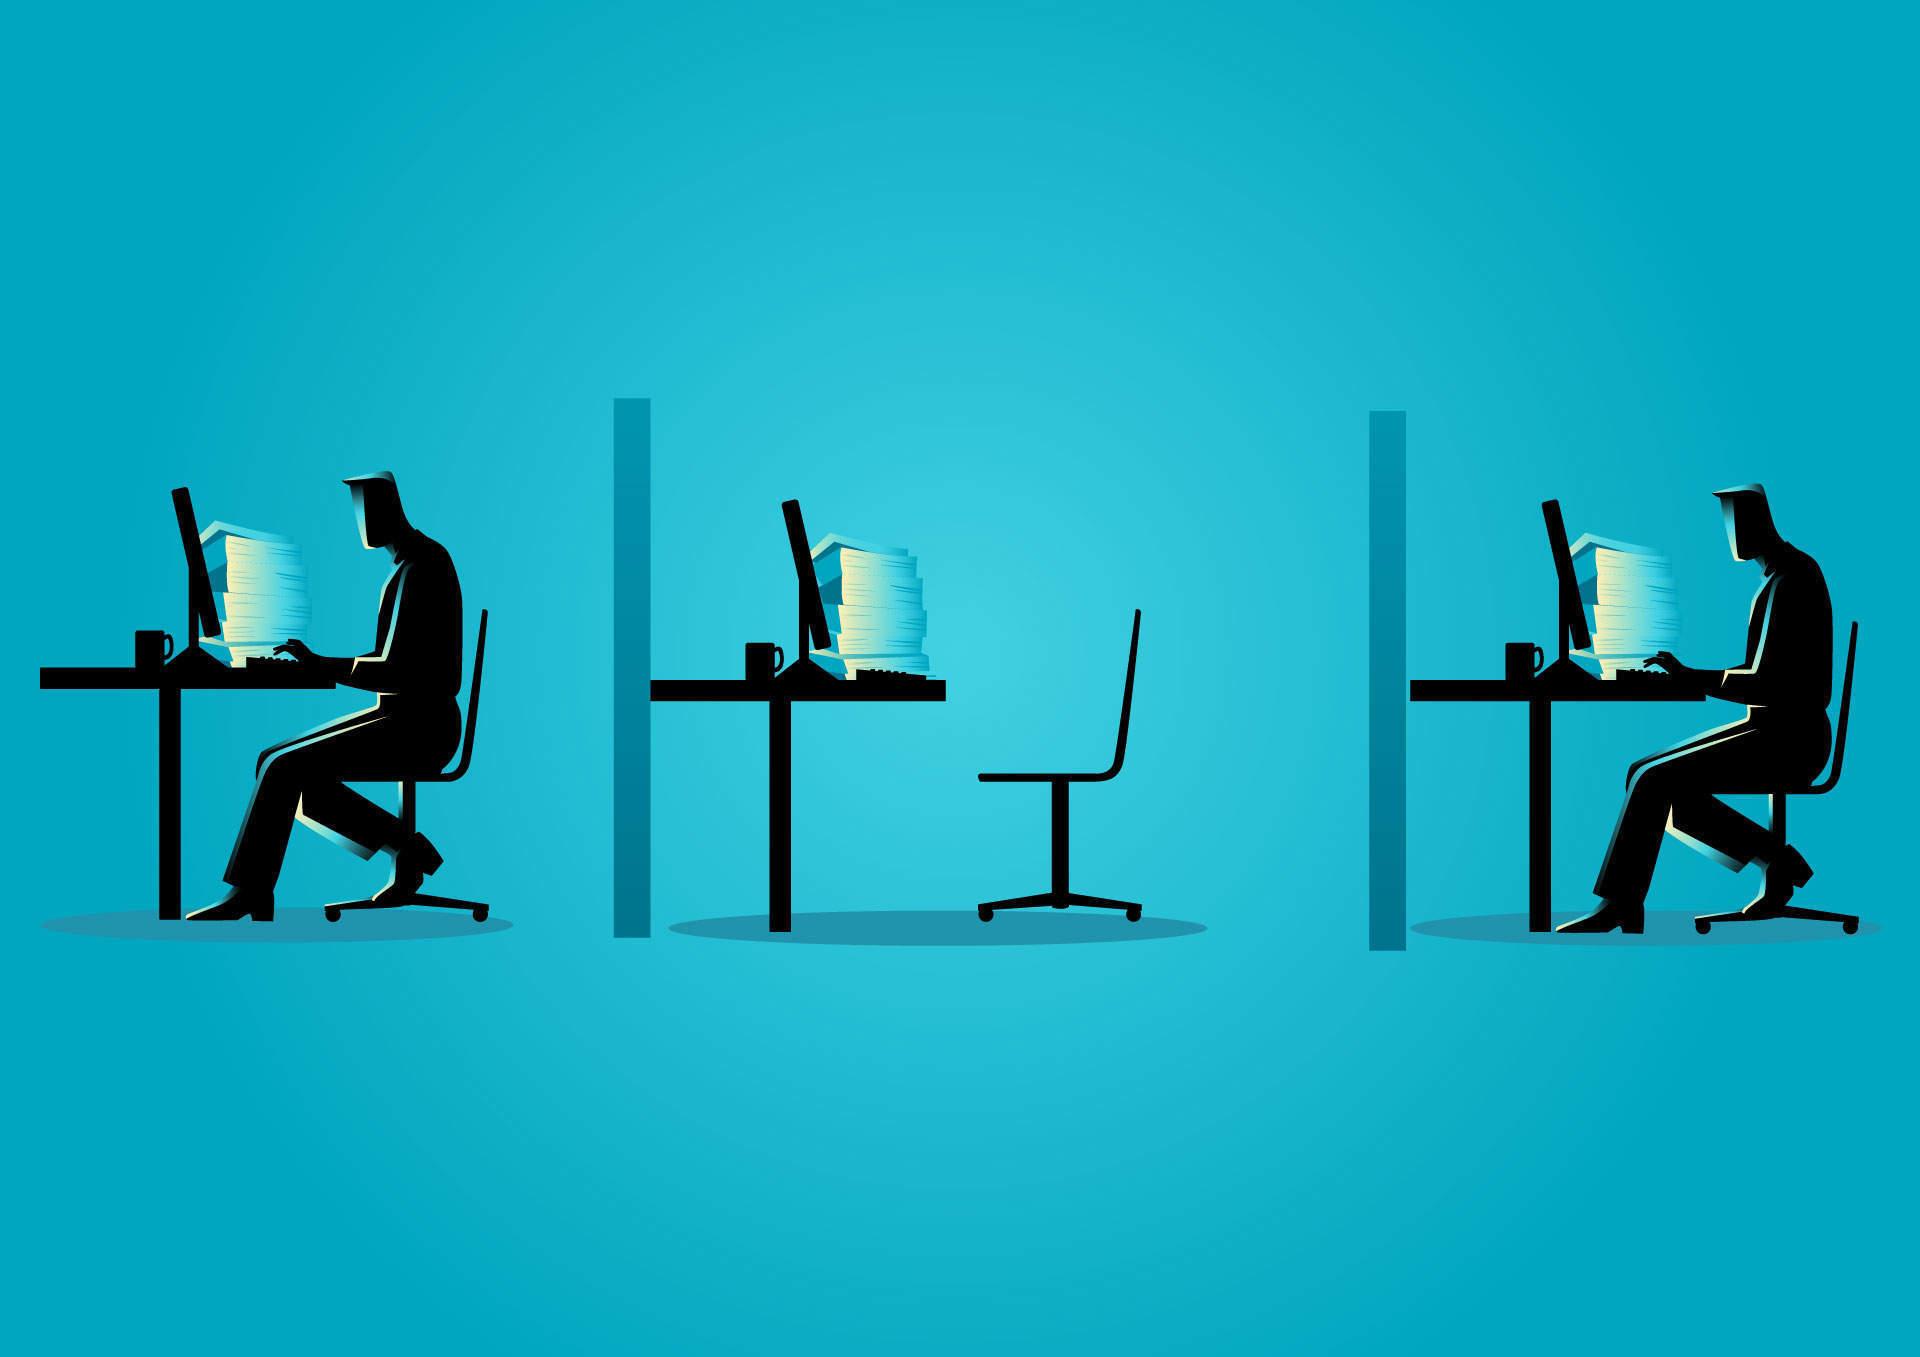 Unfilled cybersecurity jobs reach 2.9 million worldwide